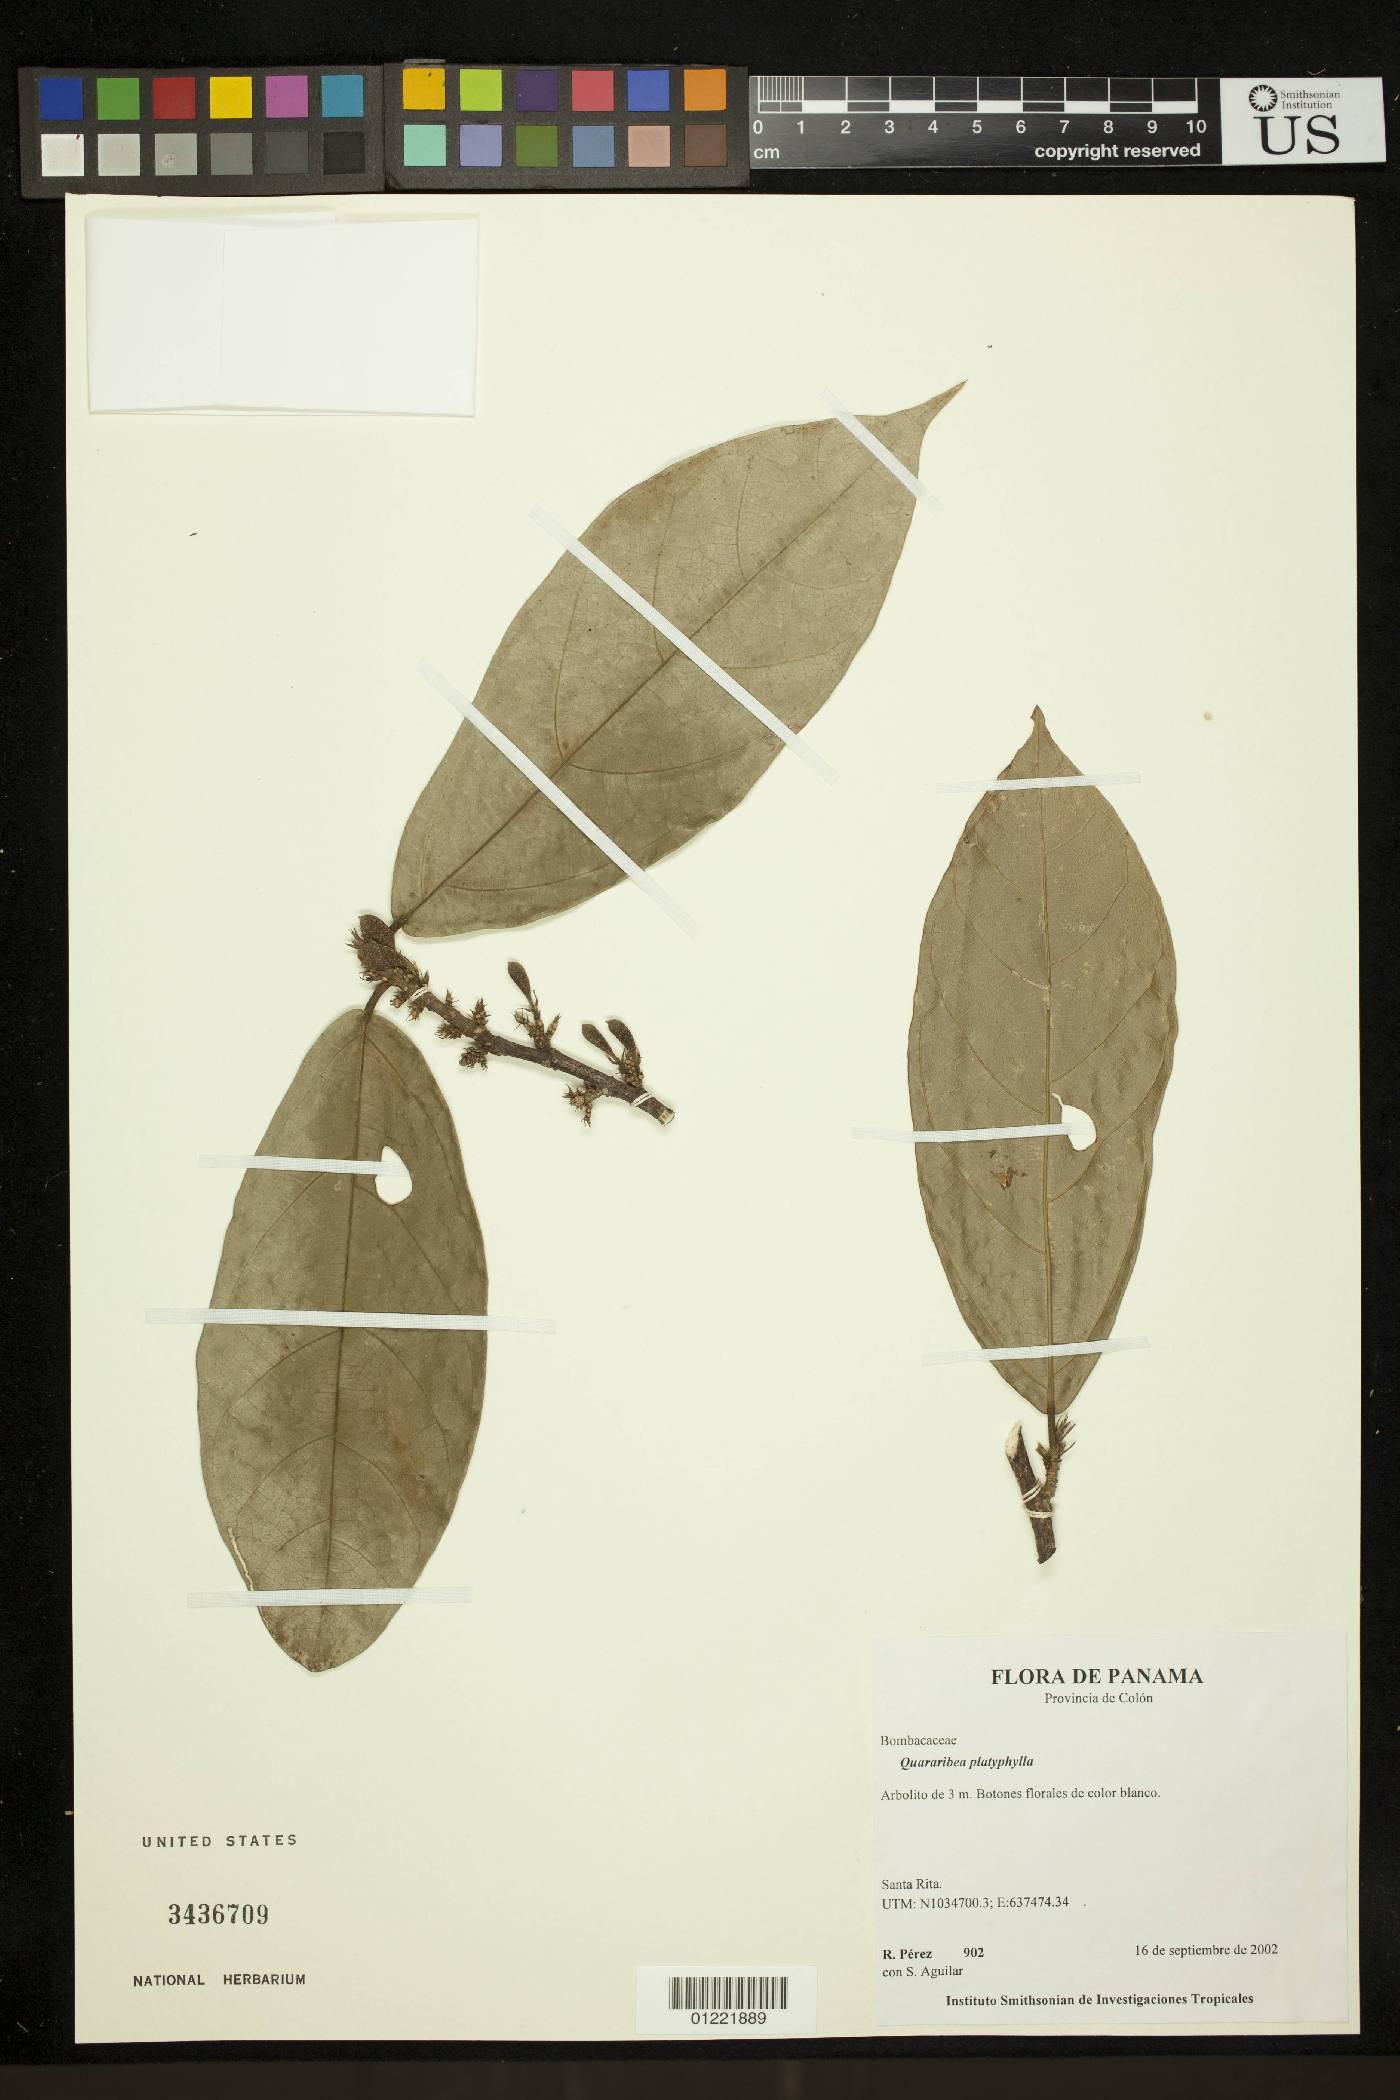 Quararibea platyphylla image